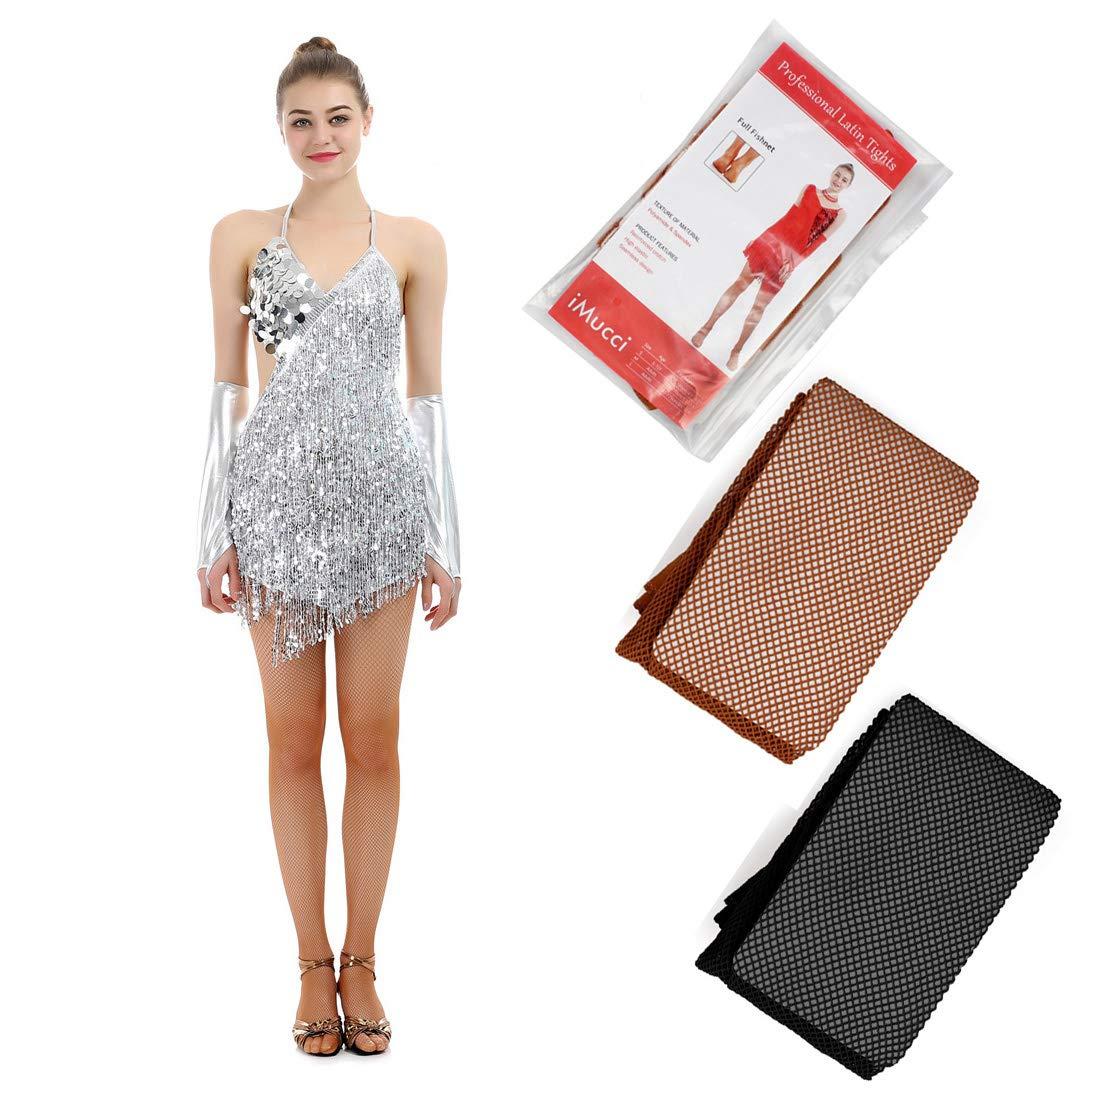 9e542fe02c0 Amazon.com  iMucci Professional Women Latin Tights - Fishnet Stockings Girl  Pantynose for Samba Tango Dancing Brown Collants Black Tan  Clothing